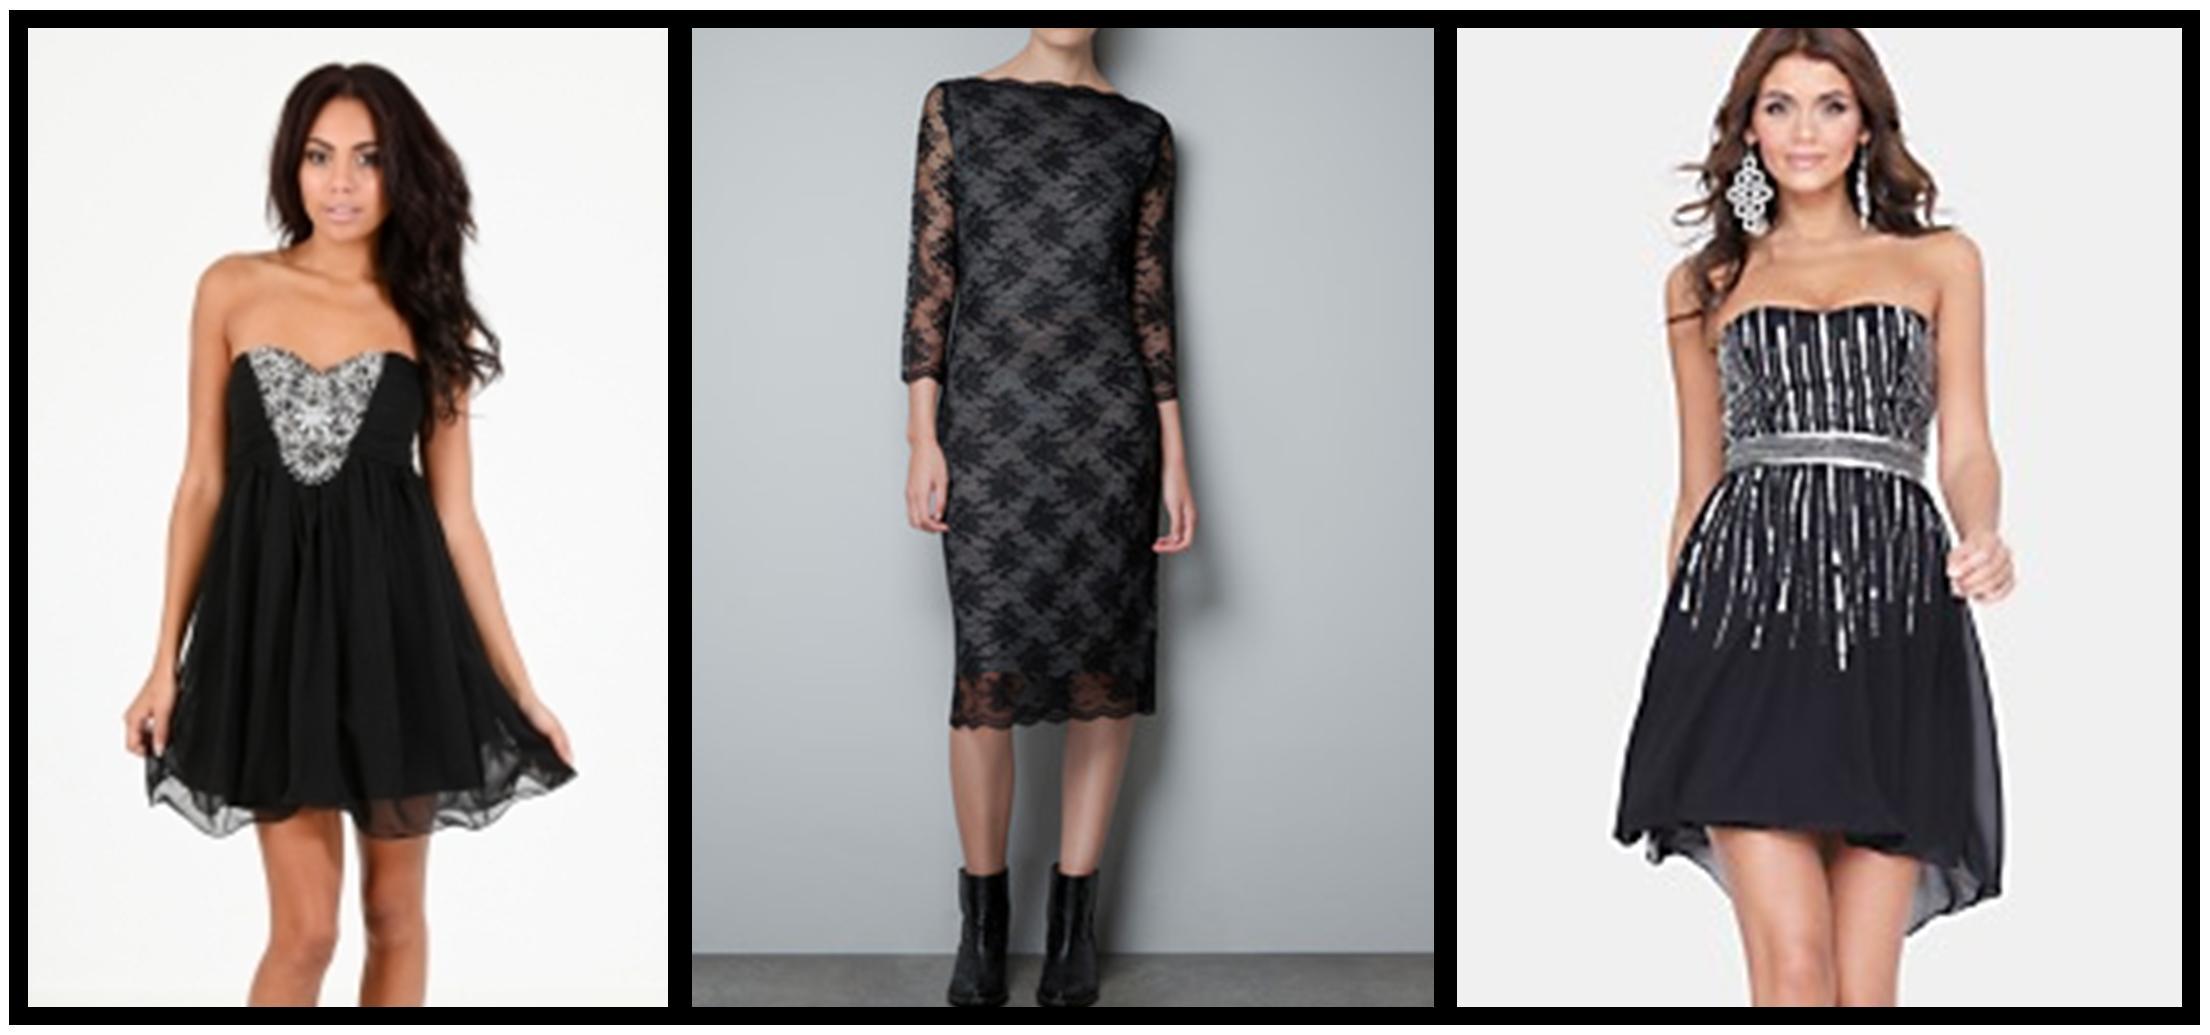 Black dress very - Black Dress Very 29